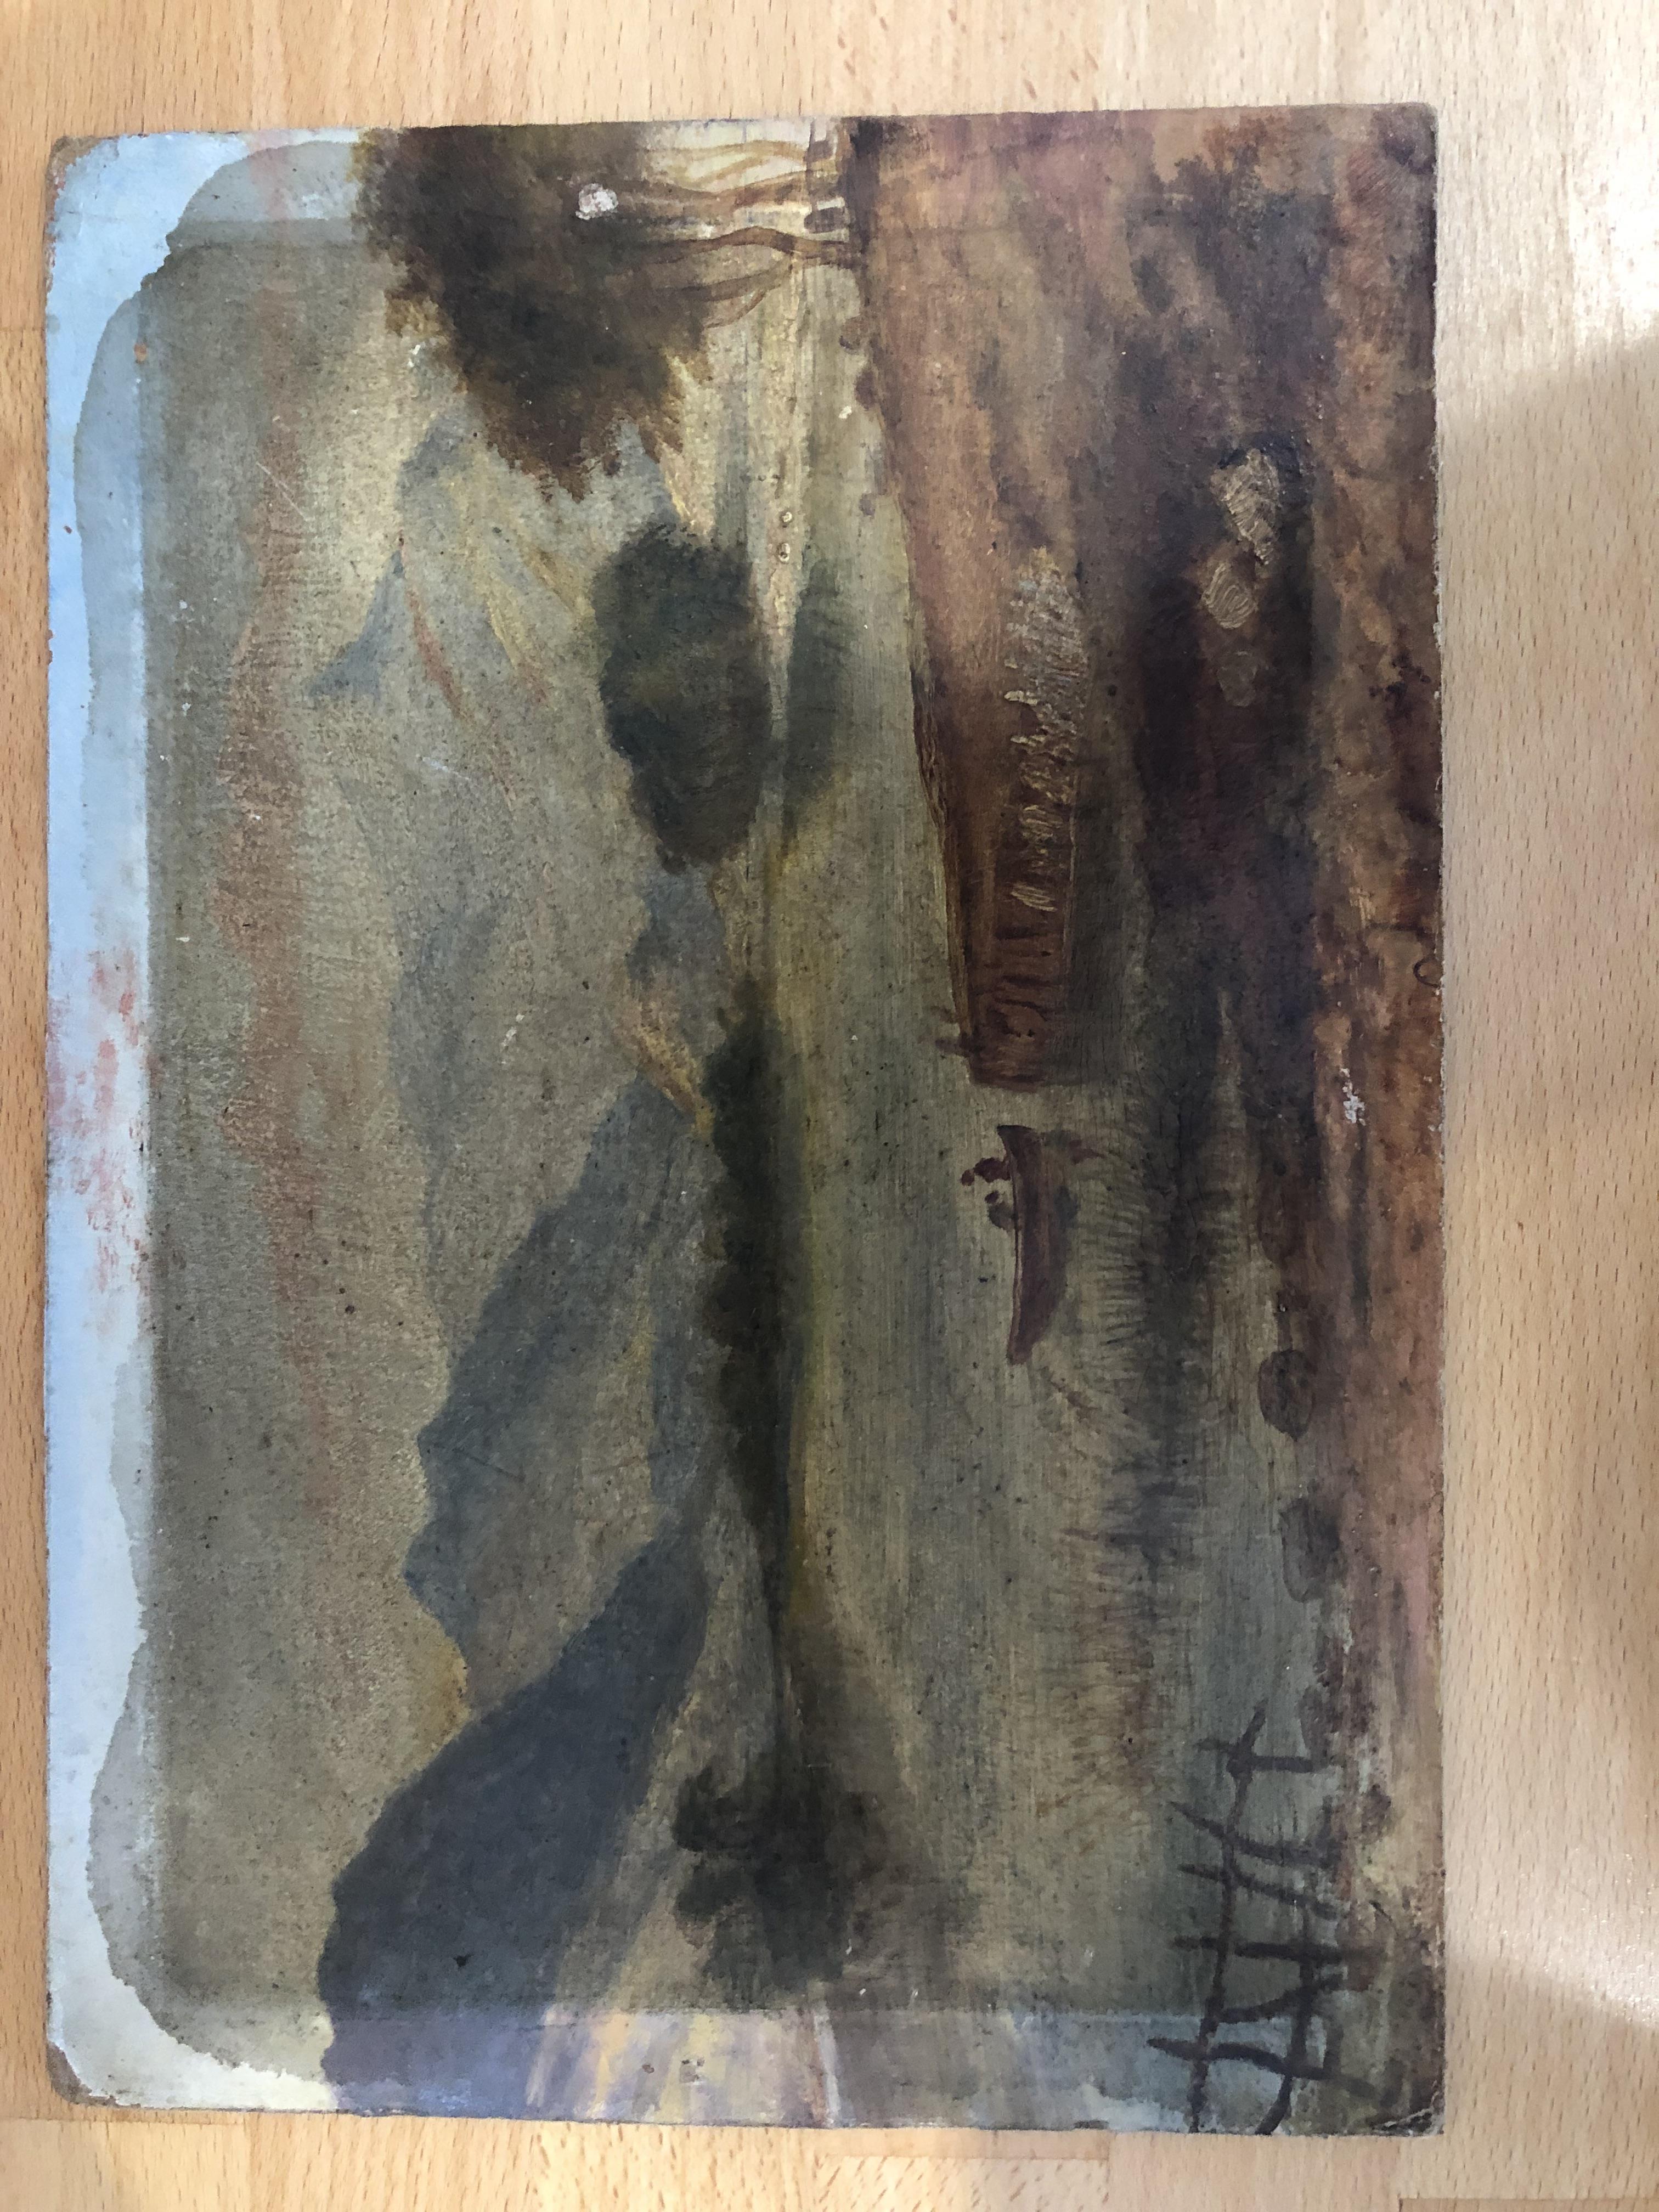 Lot 47 - Original Painting, unknown artist